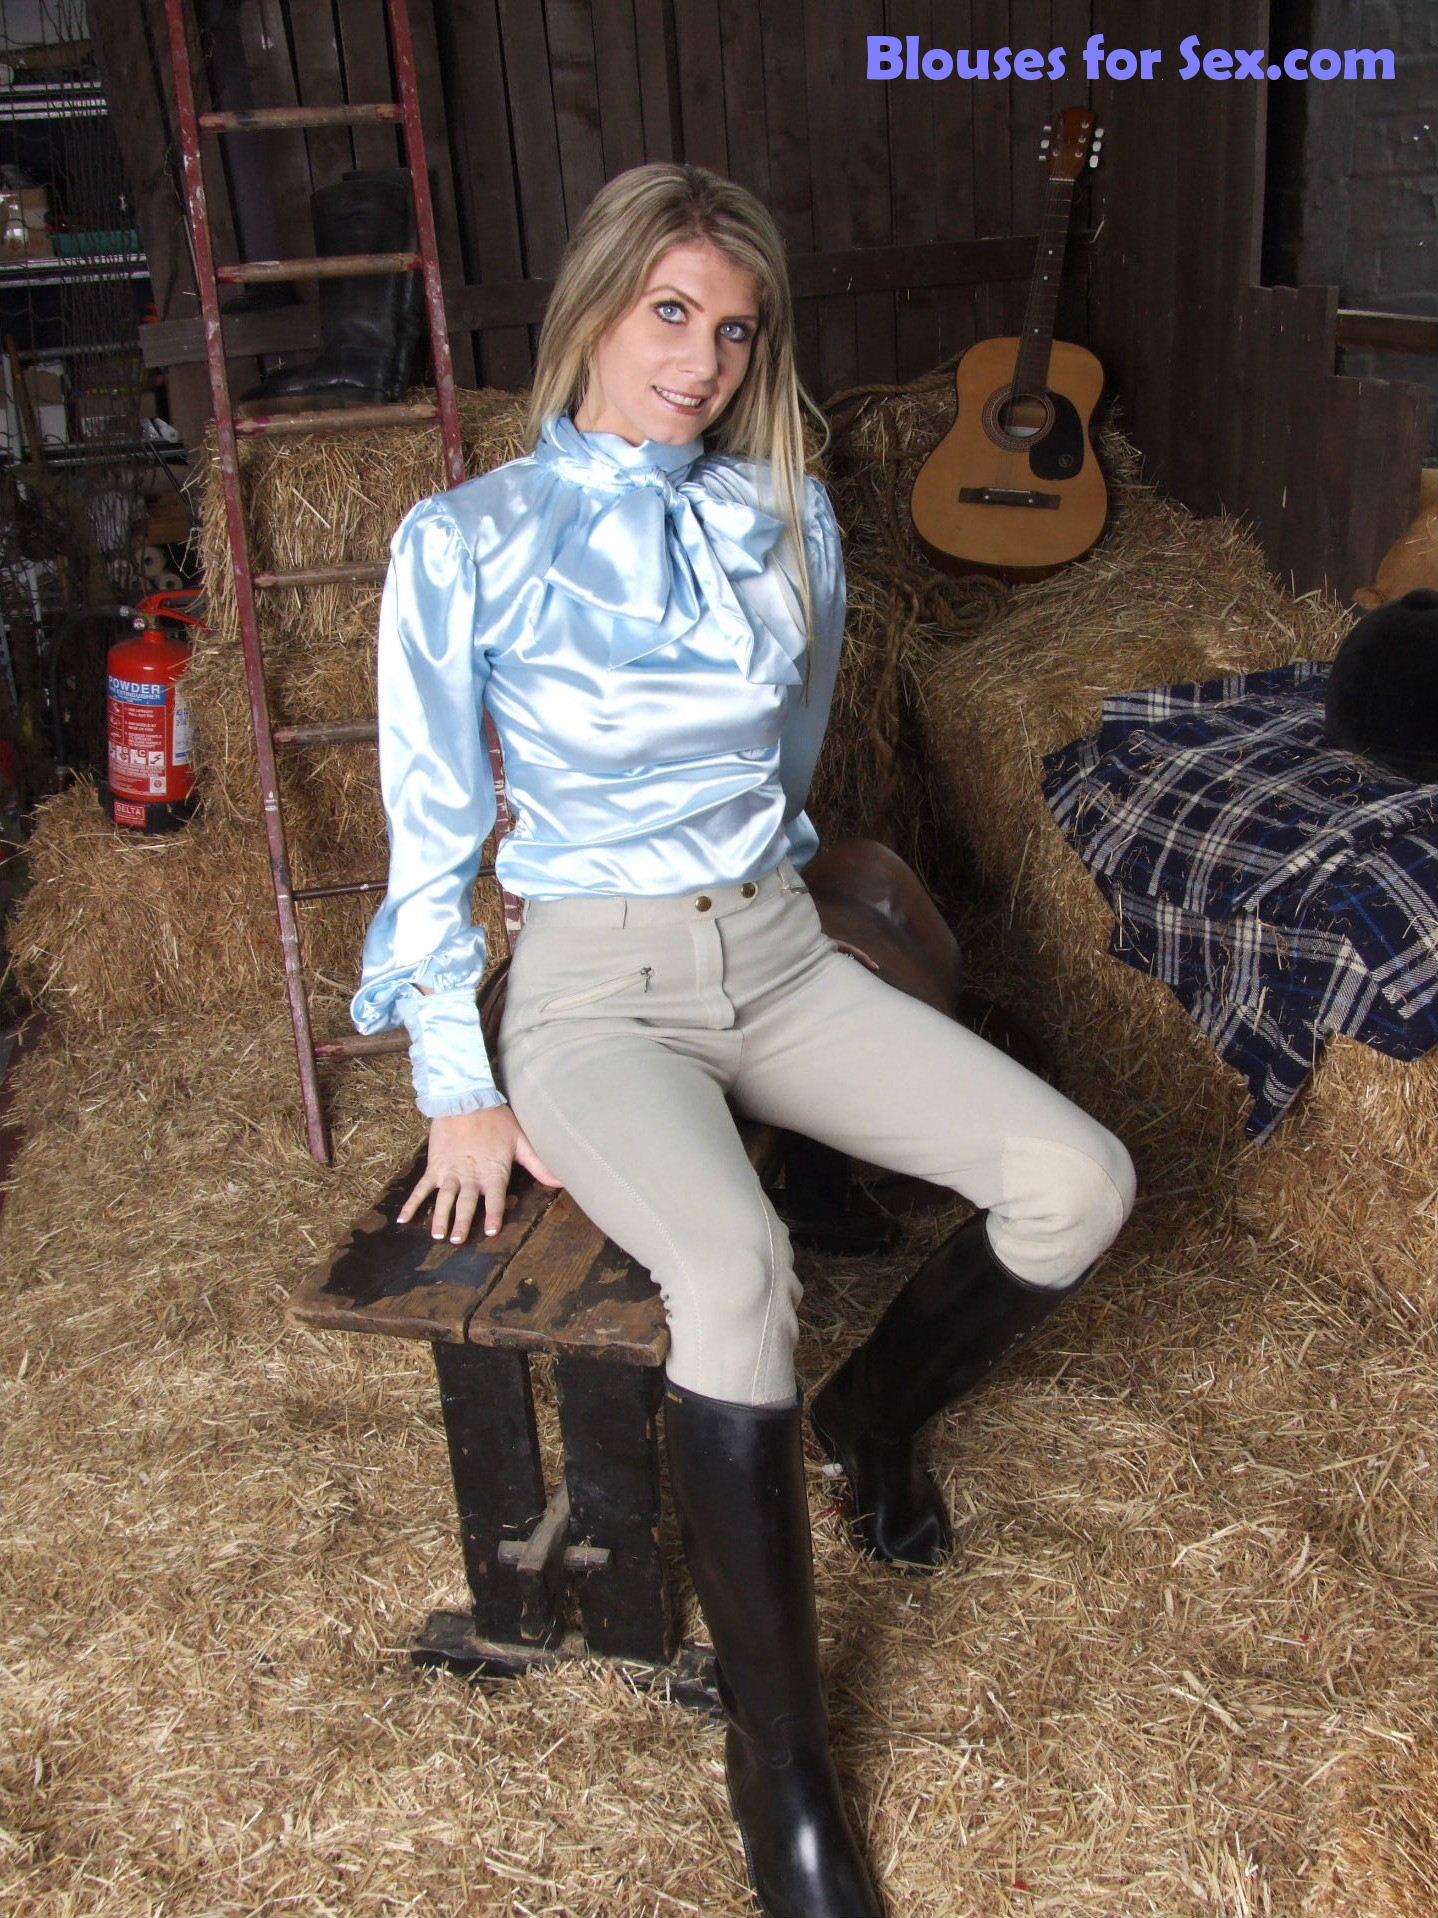 Horsegirl in Satin